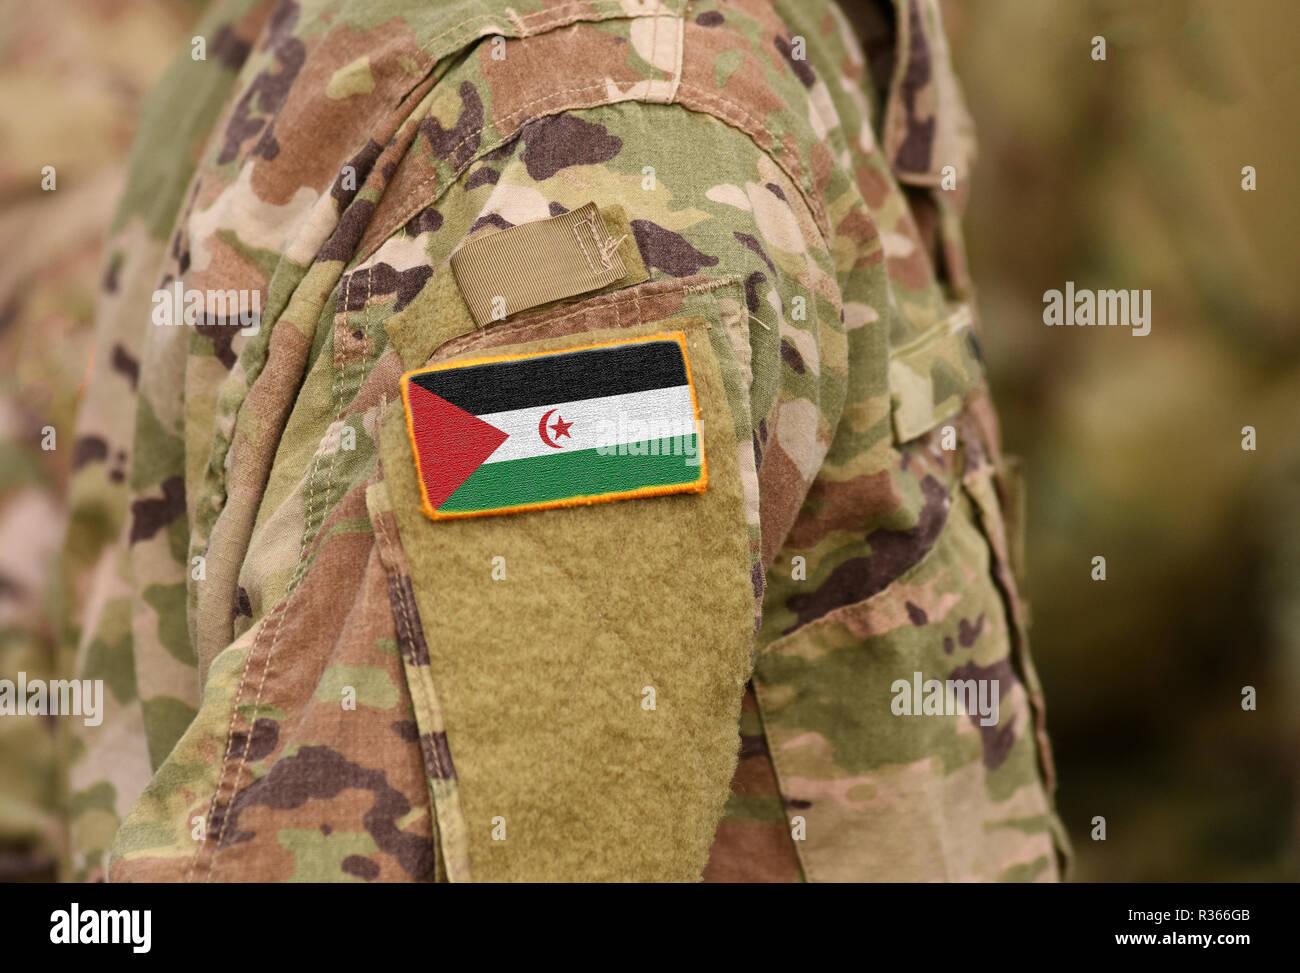 Sahrawi Arab Democratic Republic flag on soldiers arm. Sahrawi Arab Democratic Republic troops (collage) - Stock Image